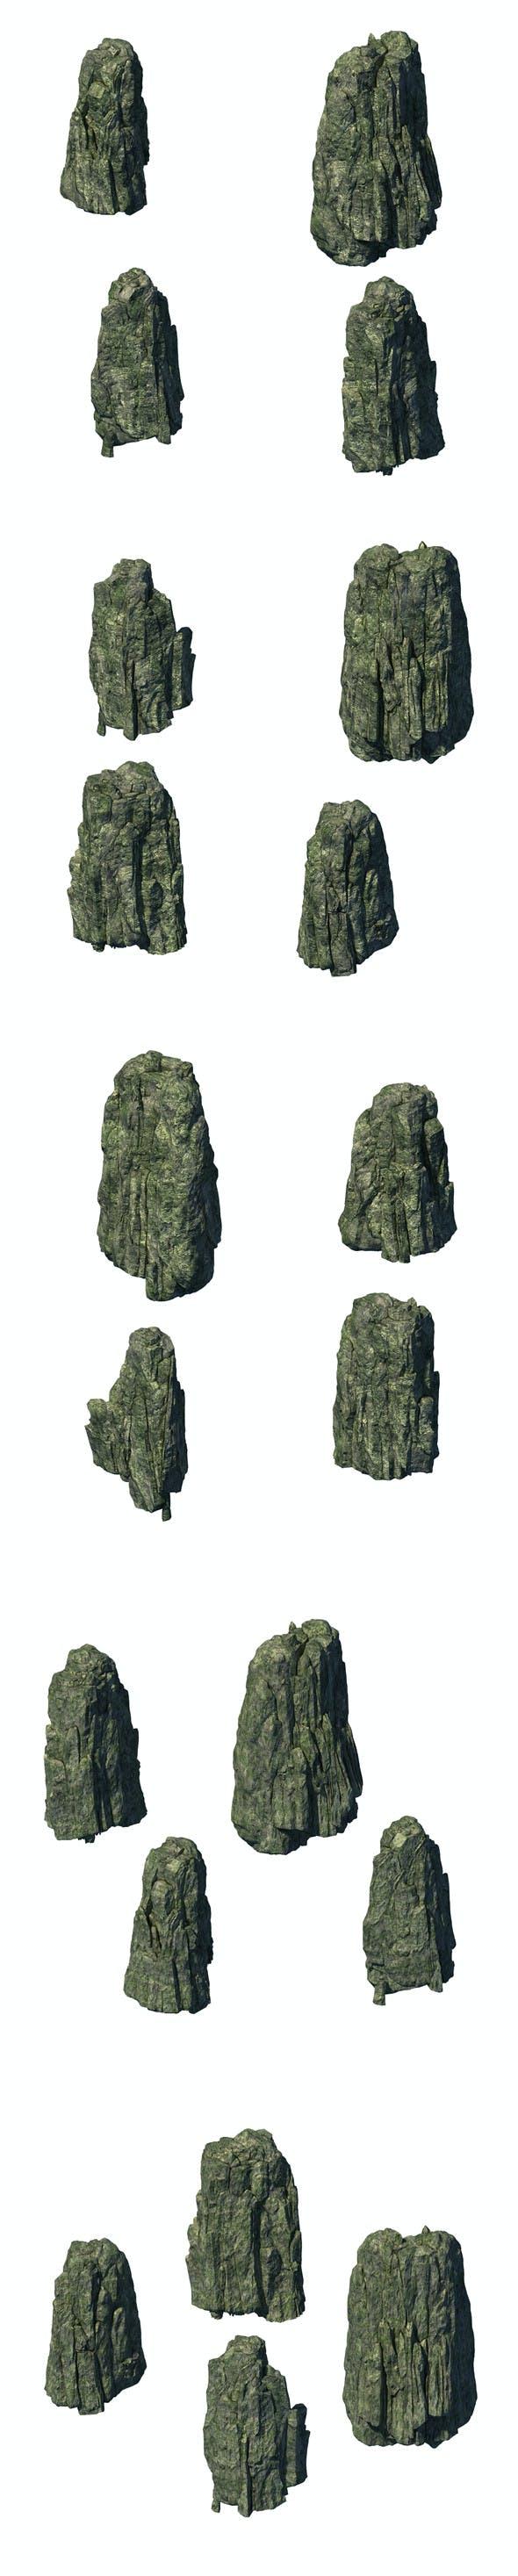 Yamagata - Stone 012 - 3DOcean Item for Sale